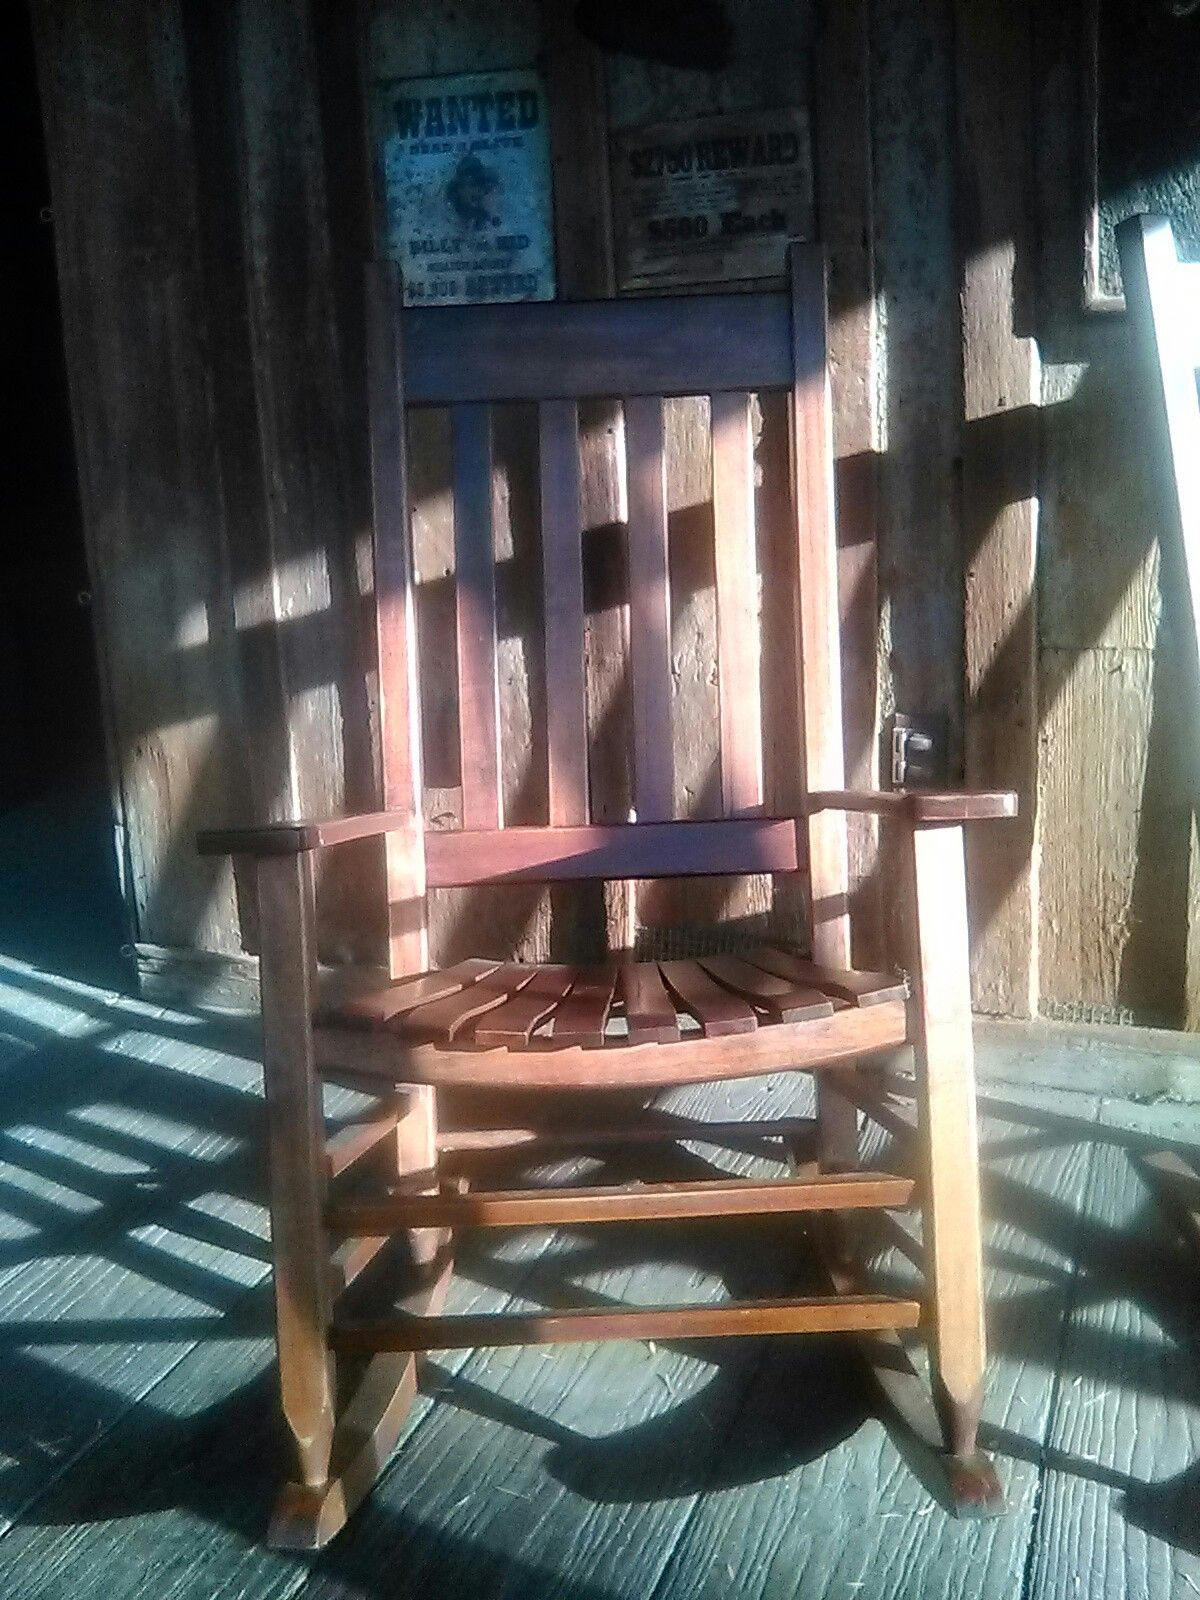 Knottu0027s Berry Farm Ghost Town rocking chair & Knottu0027s Berry Farm Ghost Town rocking chair | Knotts Berry Farm ...